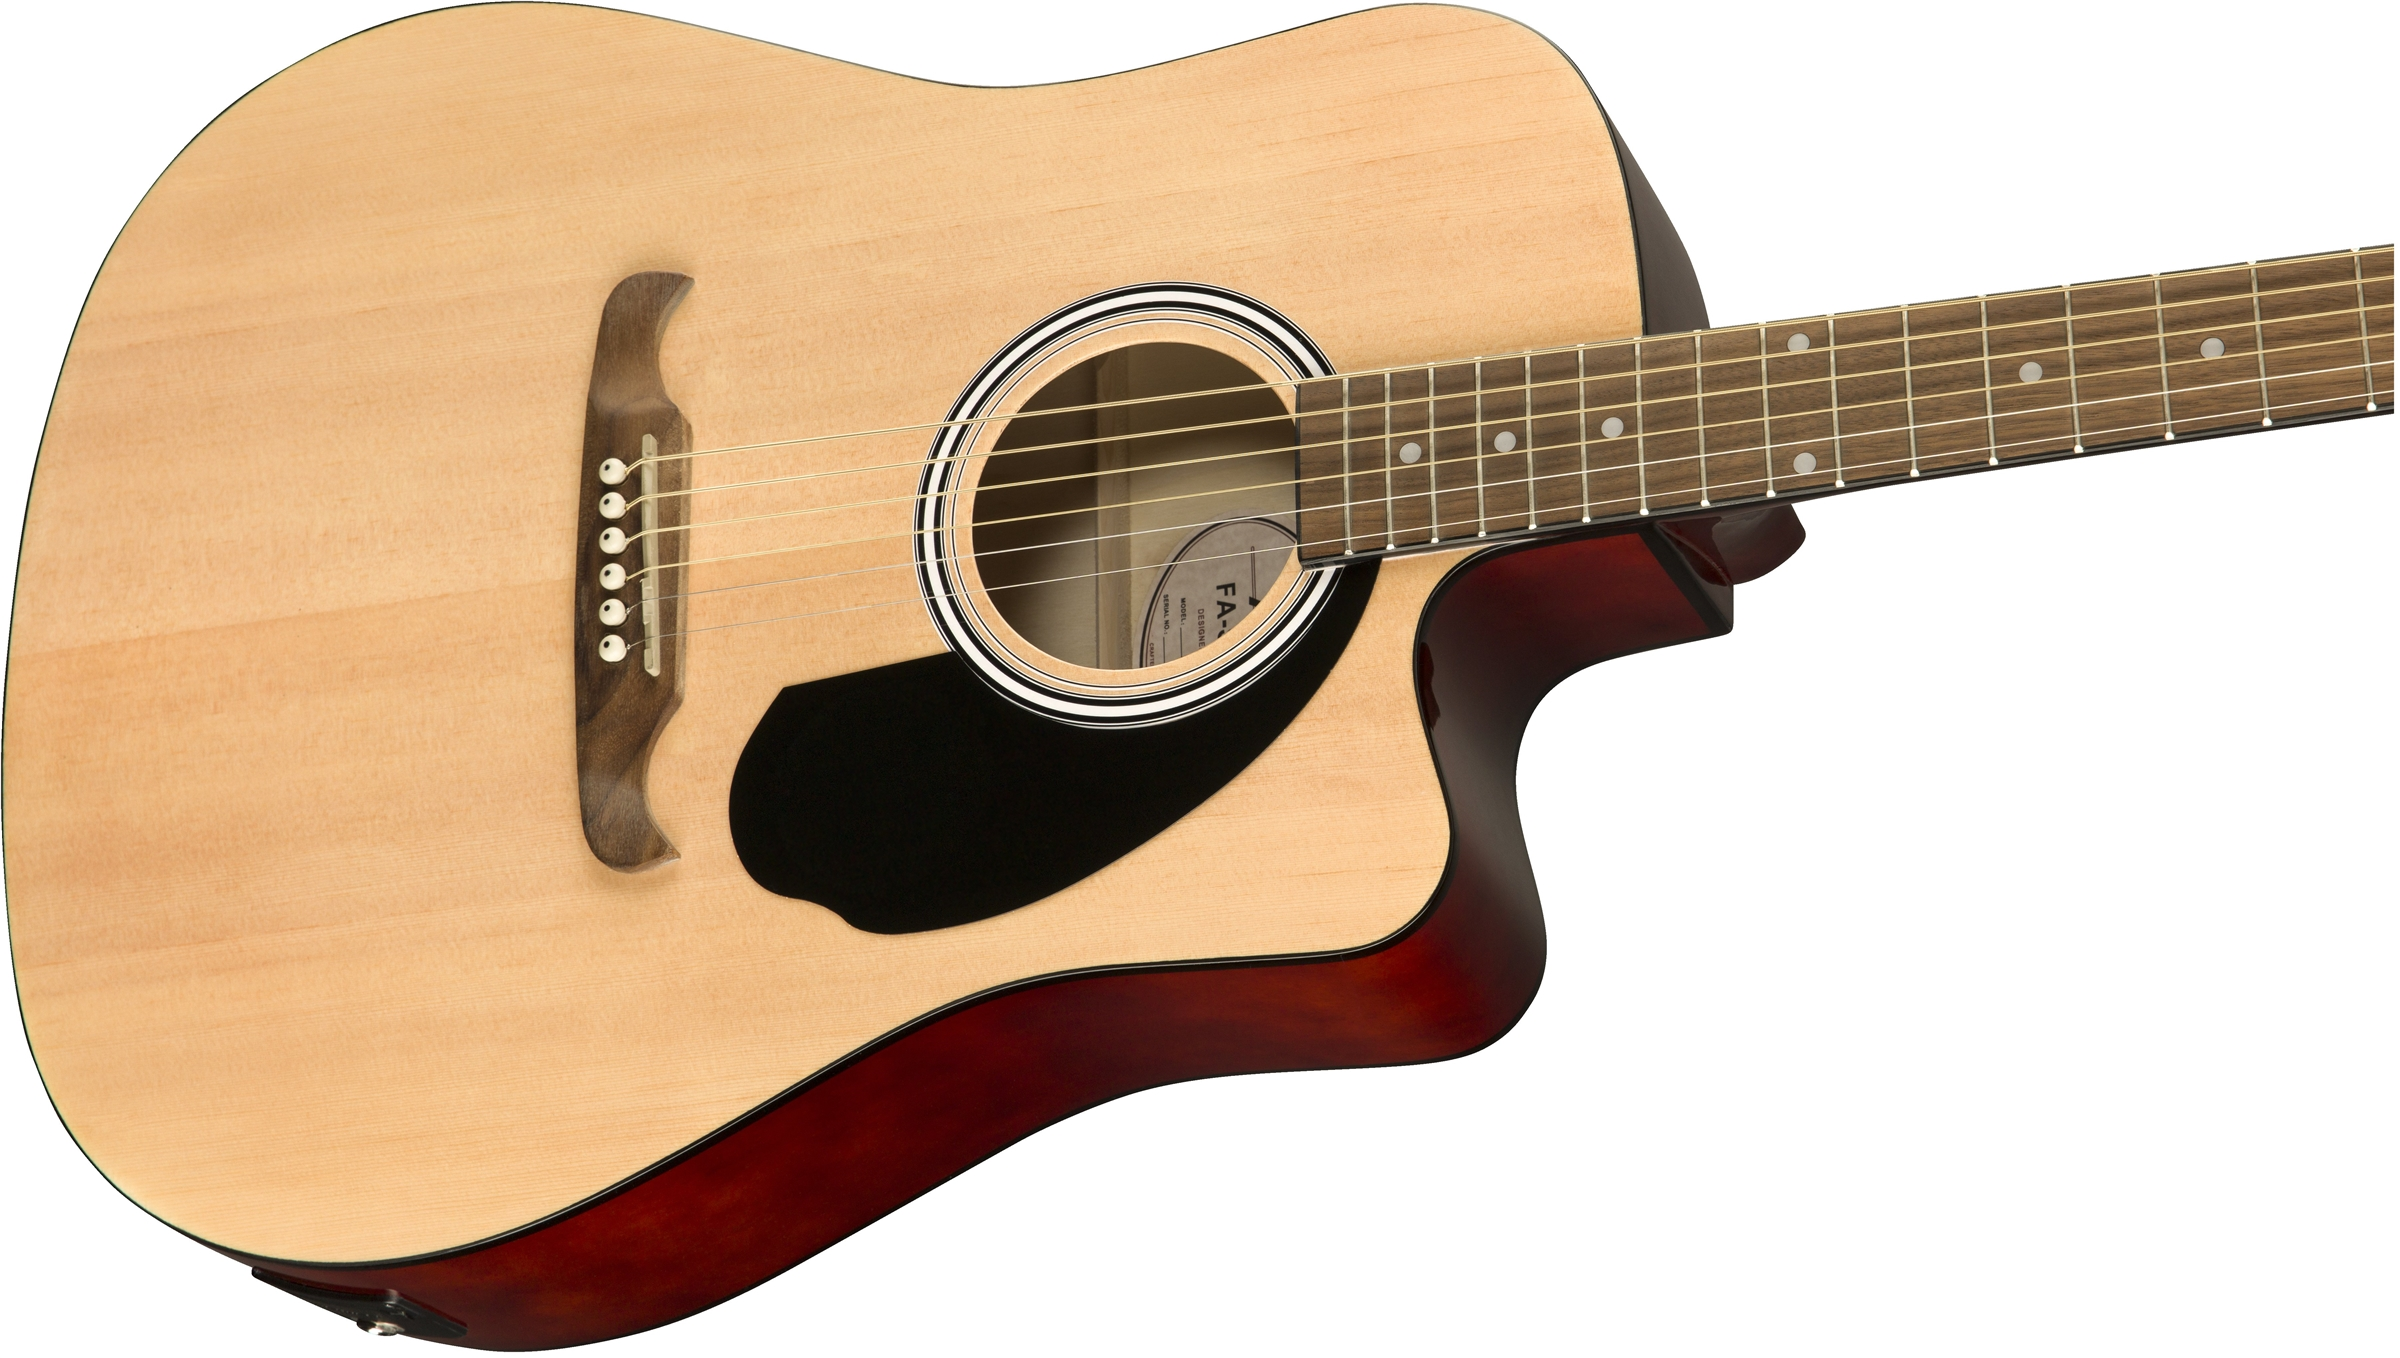 Fa 125ce Dreadnought Walnut Fingerboard Acoustic Guitars